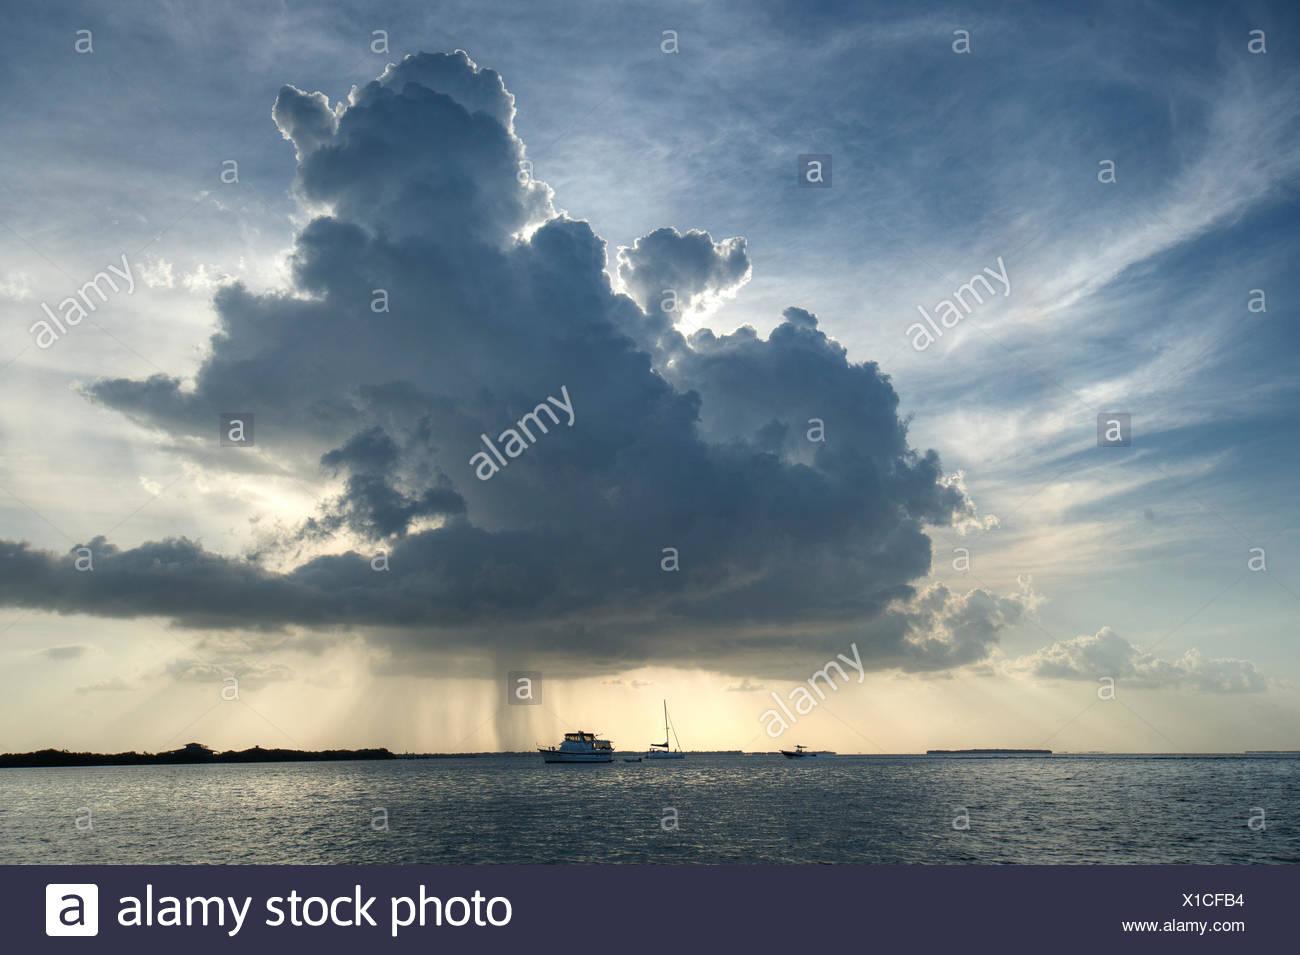 Orage à l'horizon. Photo Stock